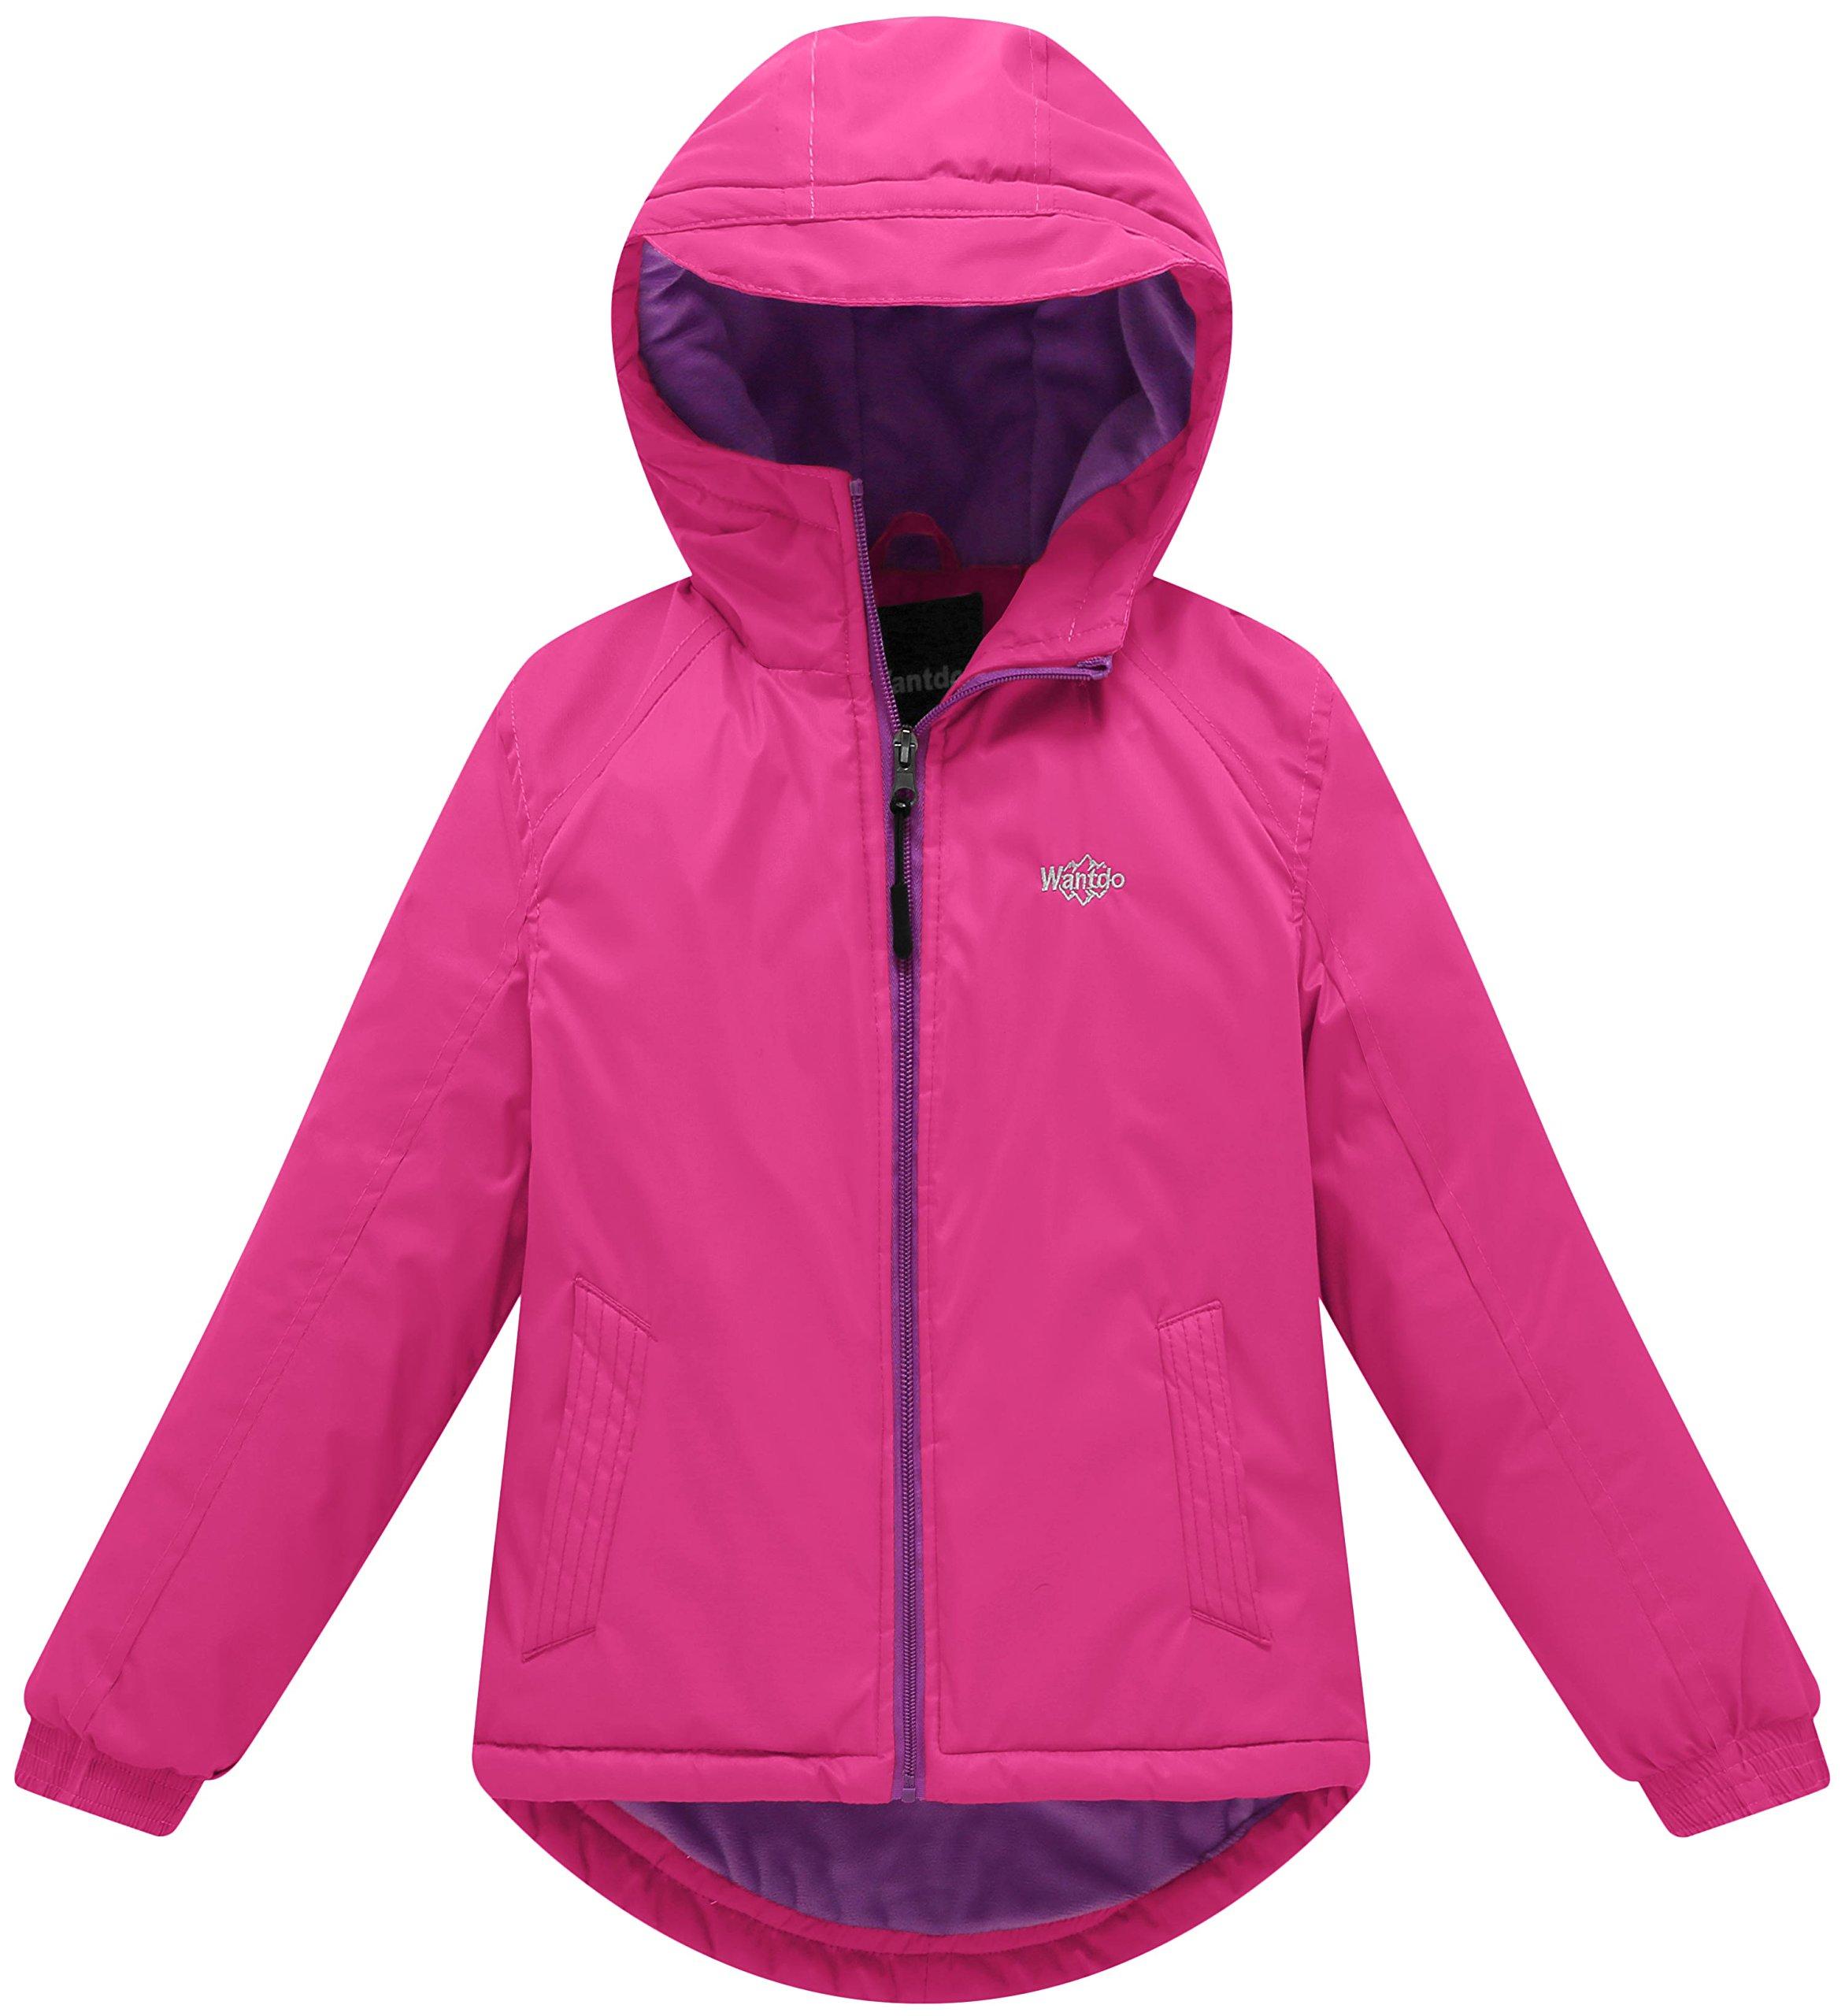 Wantdo Girl's Hooded Rain Jacket with Fleece Lining Windcheater Outdoor Short Parka(Rose Red, 6/7)